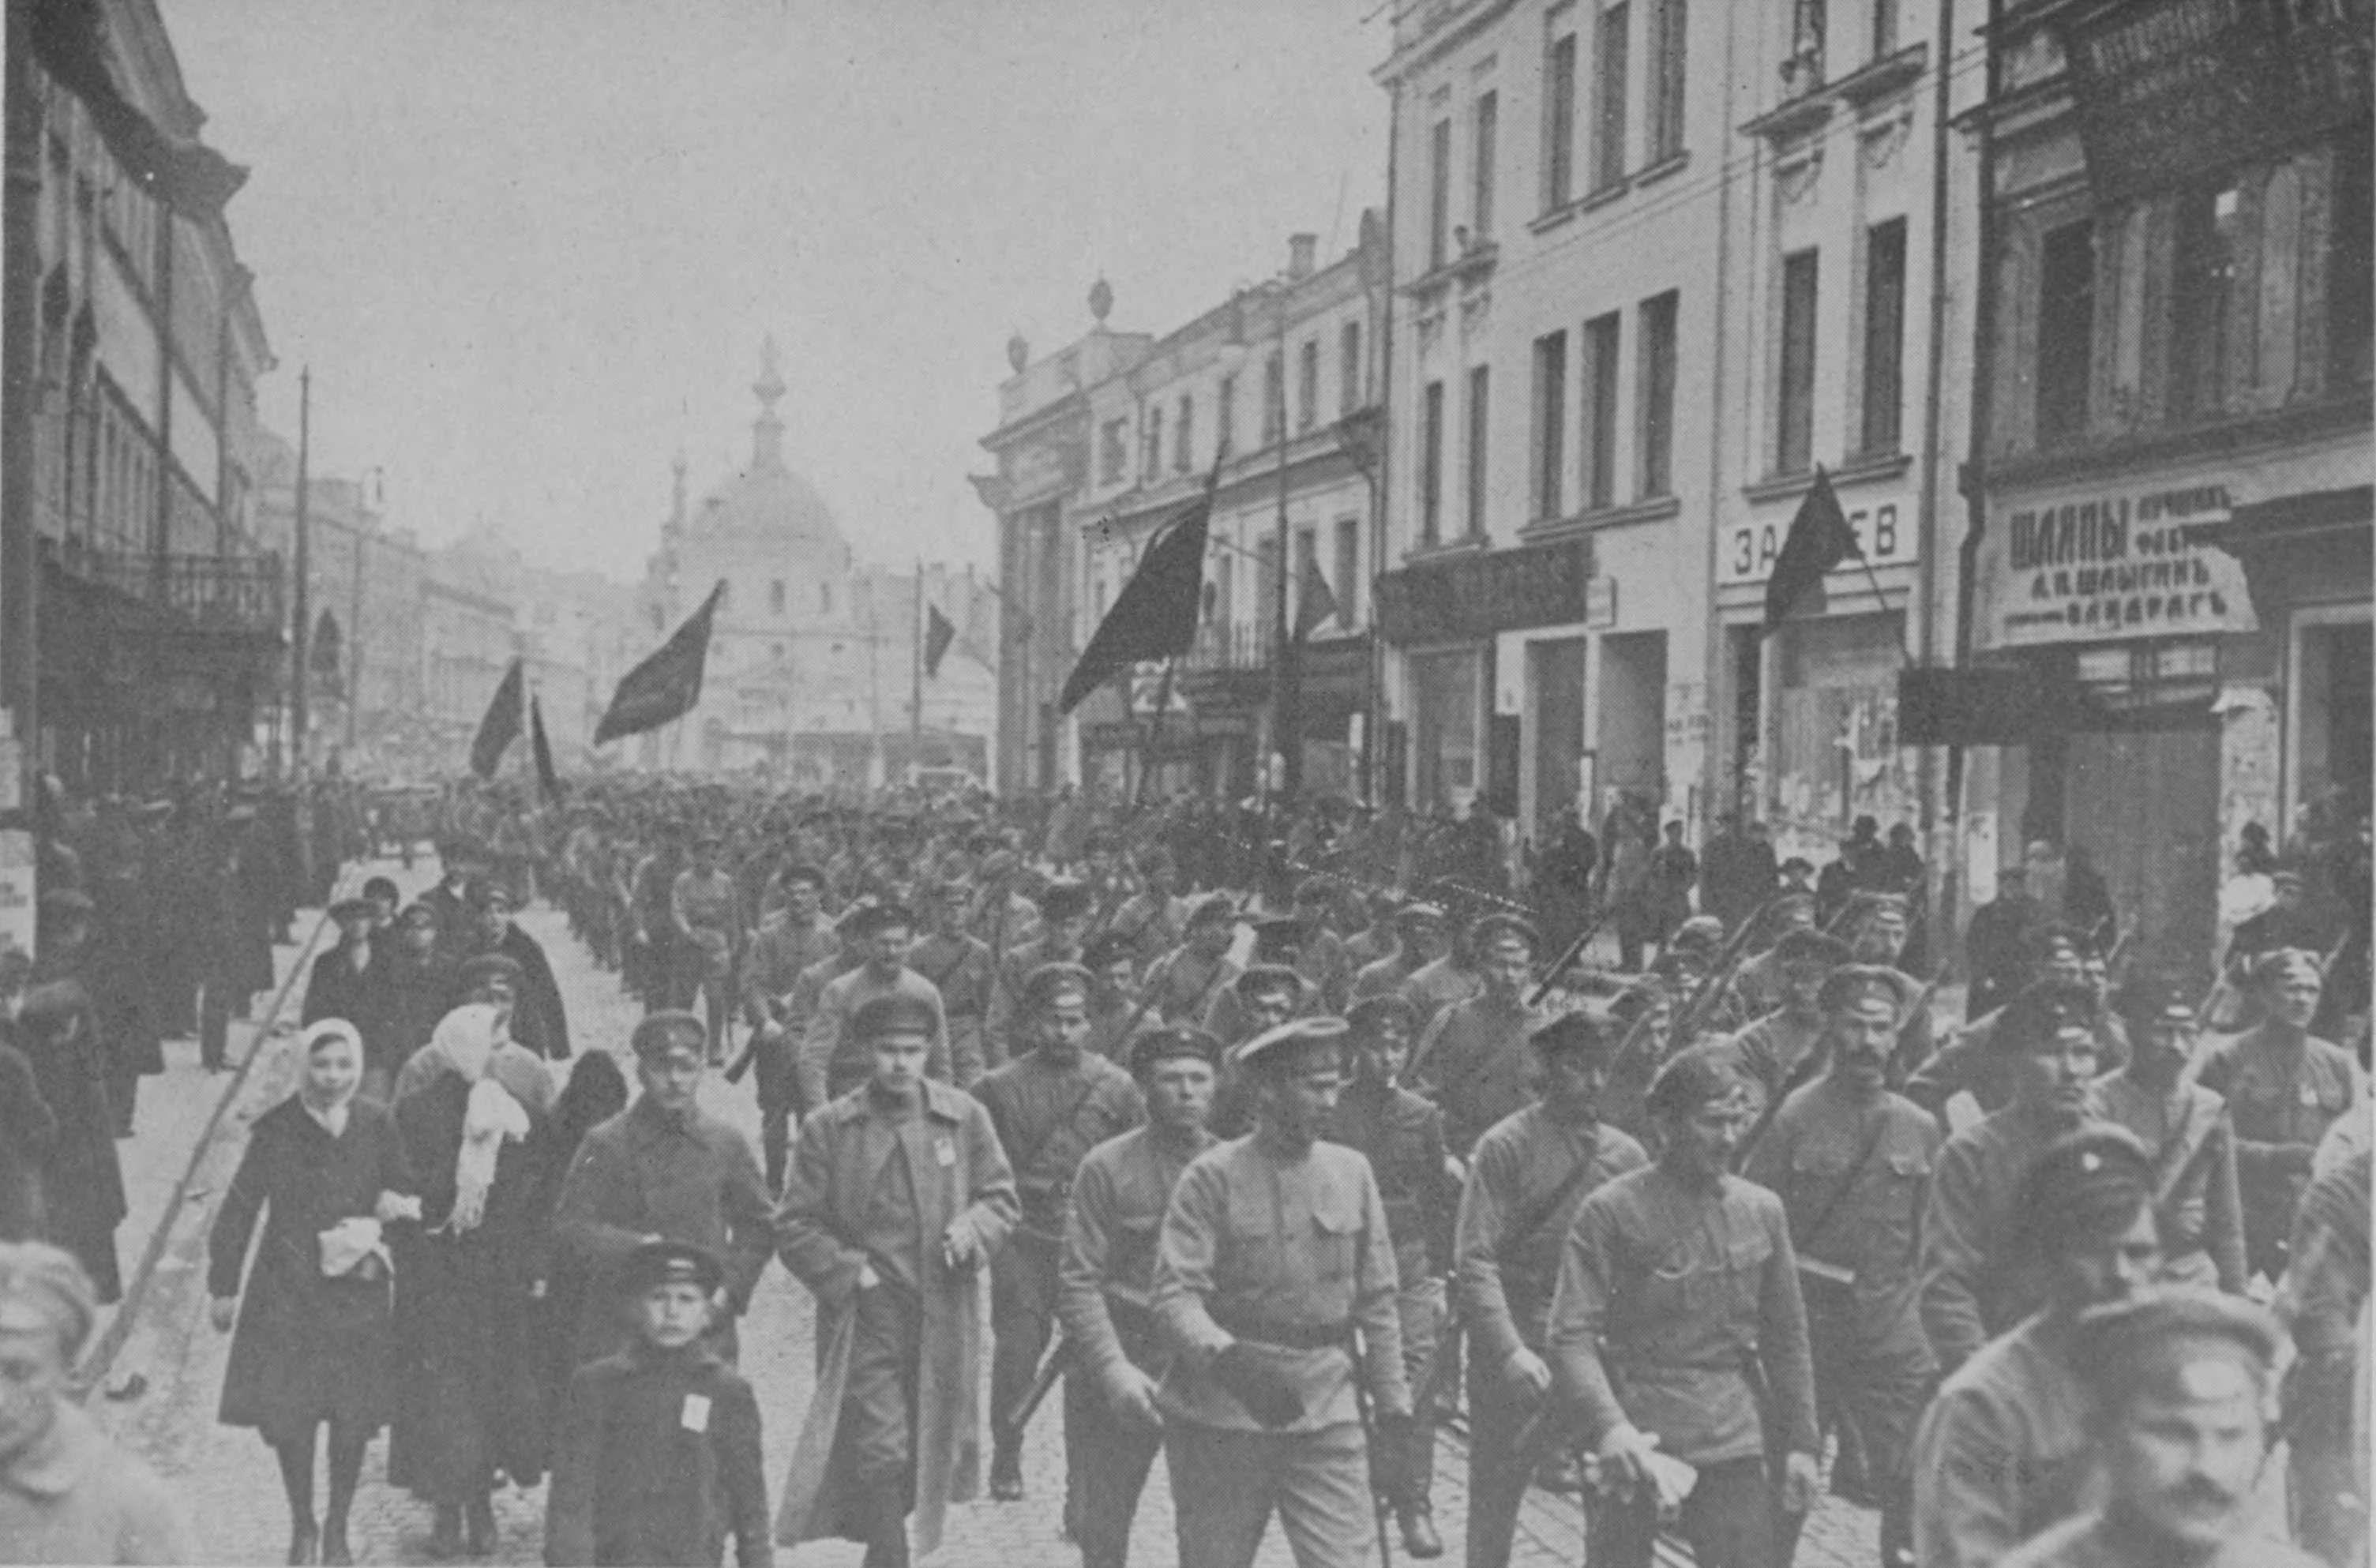 Mπολσεβίκoi κόκκινοι φρουροί σε πορεία διαμαρτυρίας το 1917 για την επιστράτευση 11 εκατομμυρίων χωρικών στα πλαίσια του Α΄ Παγκοσμίου Πολέμου.